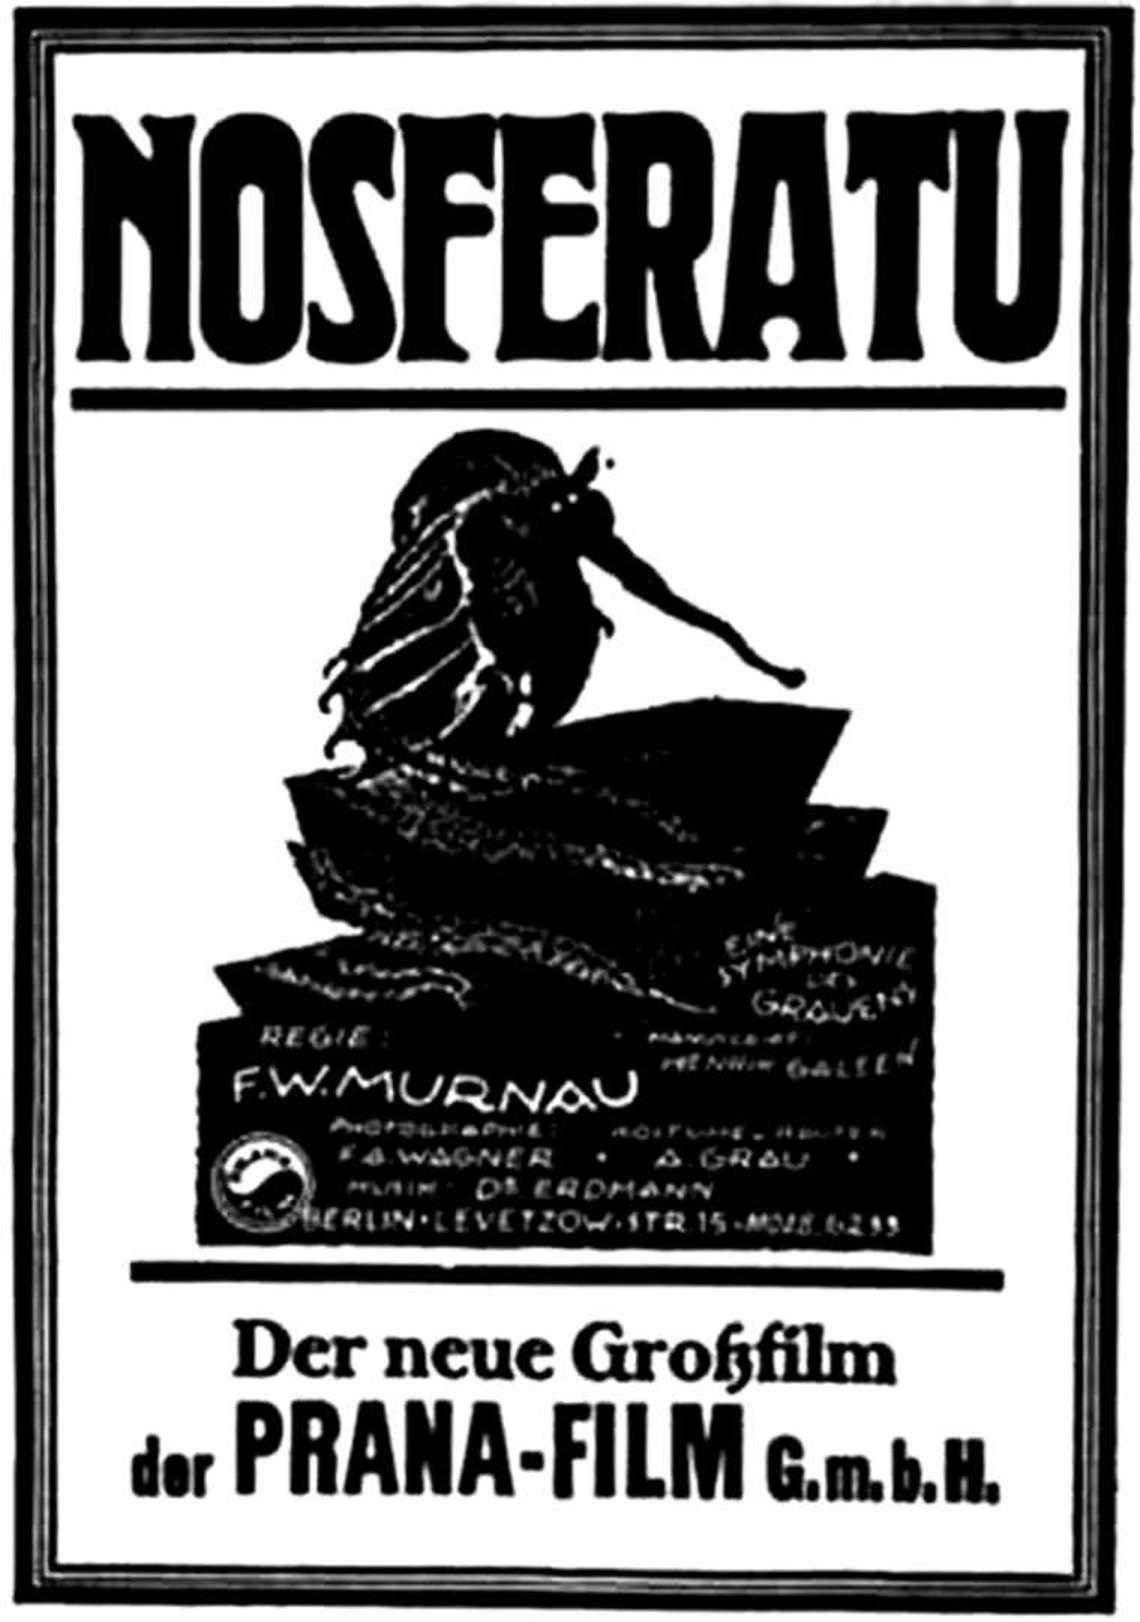 Nosferatu Movie Poster 1922 This Film Was An Unauthorized Version